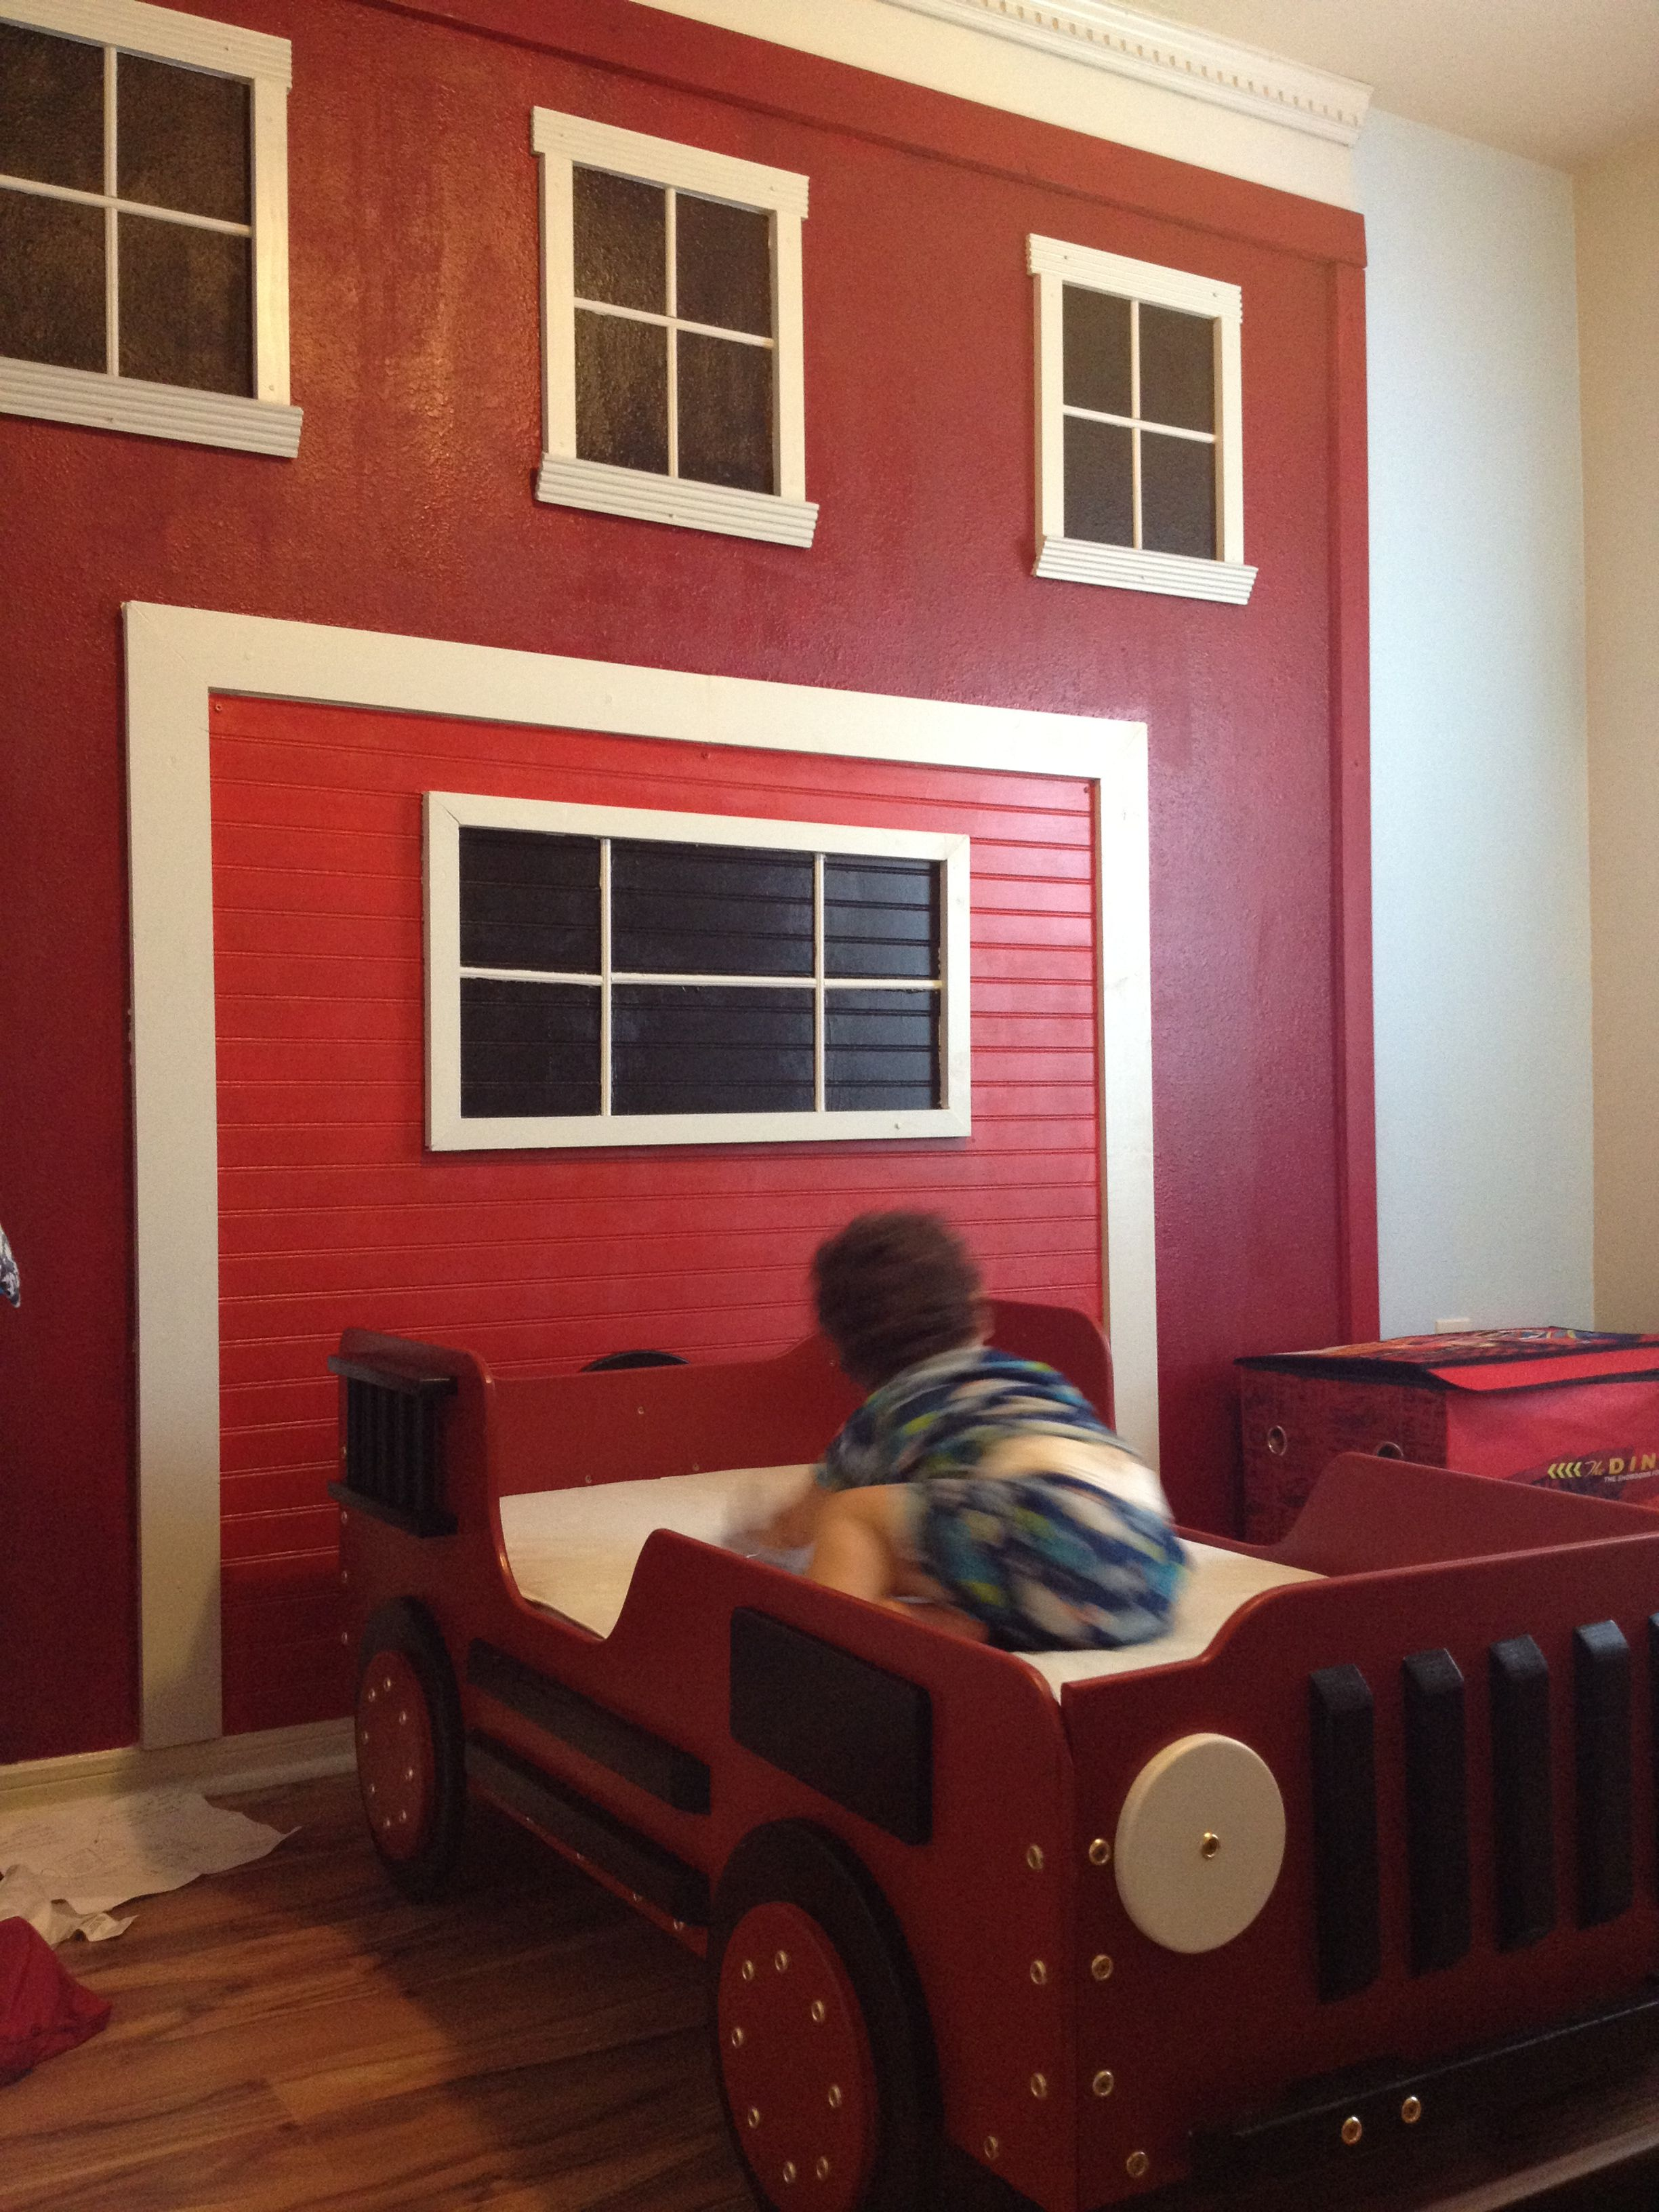 Fire Station Toddler Room Kids Superhero Room